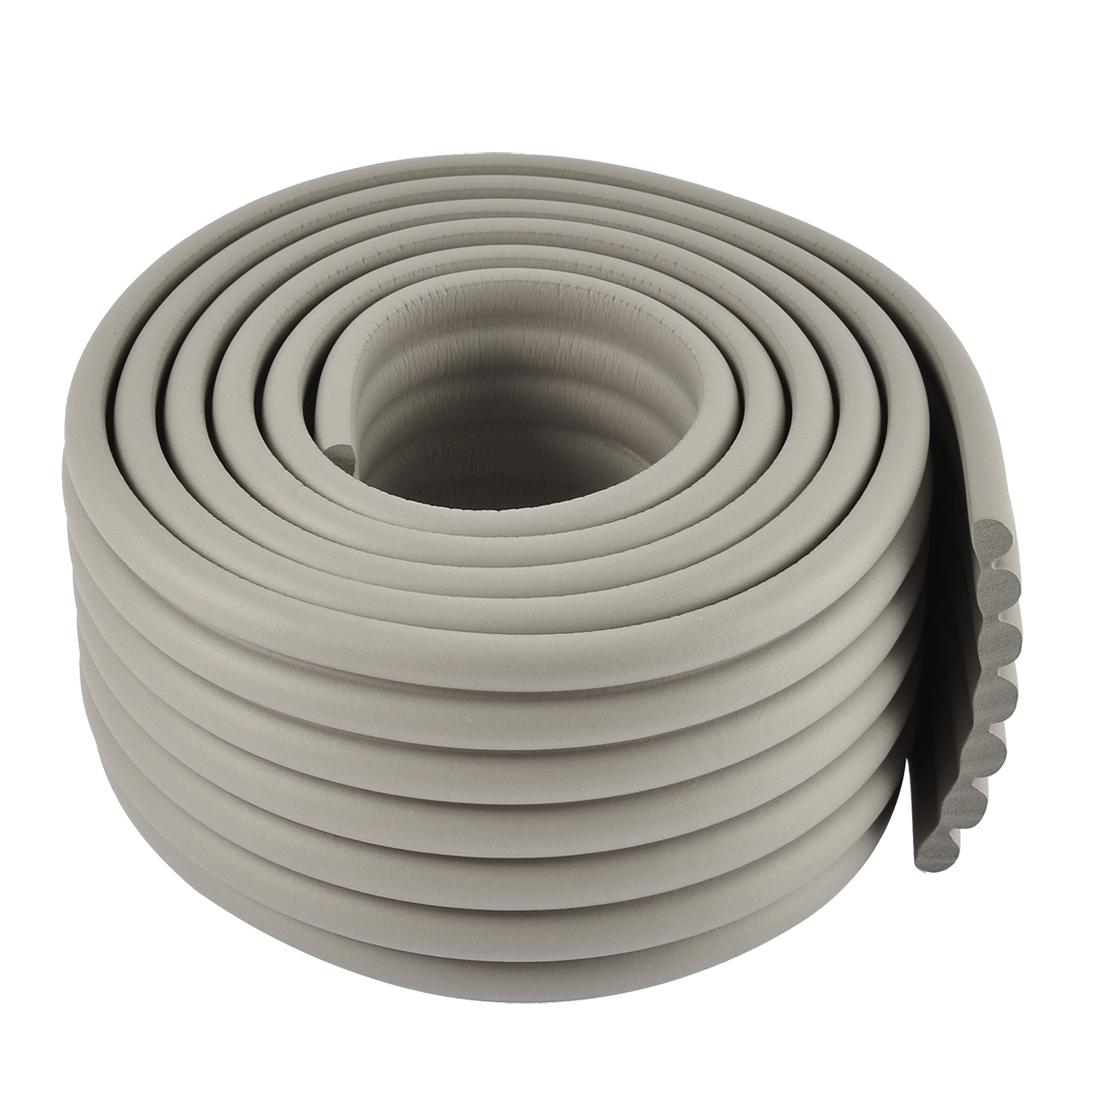 Table Edge Corner Cushion Guard Protector Bumper Strip w Adhesive Tape